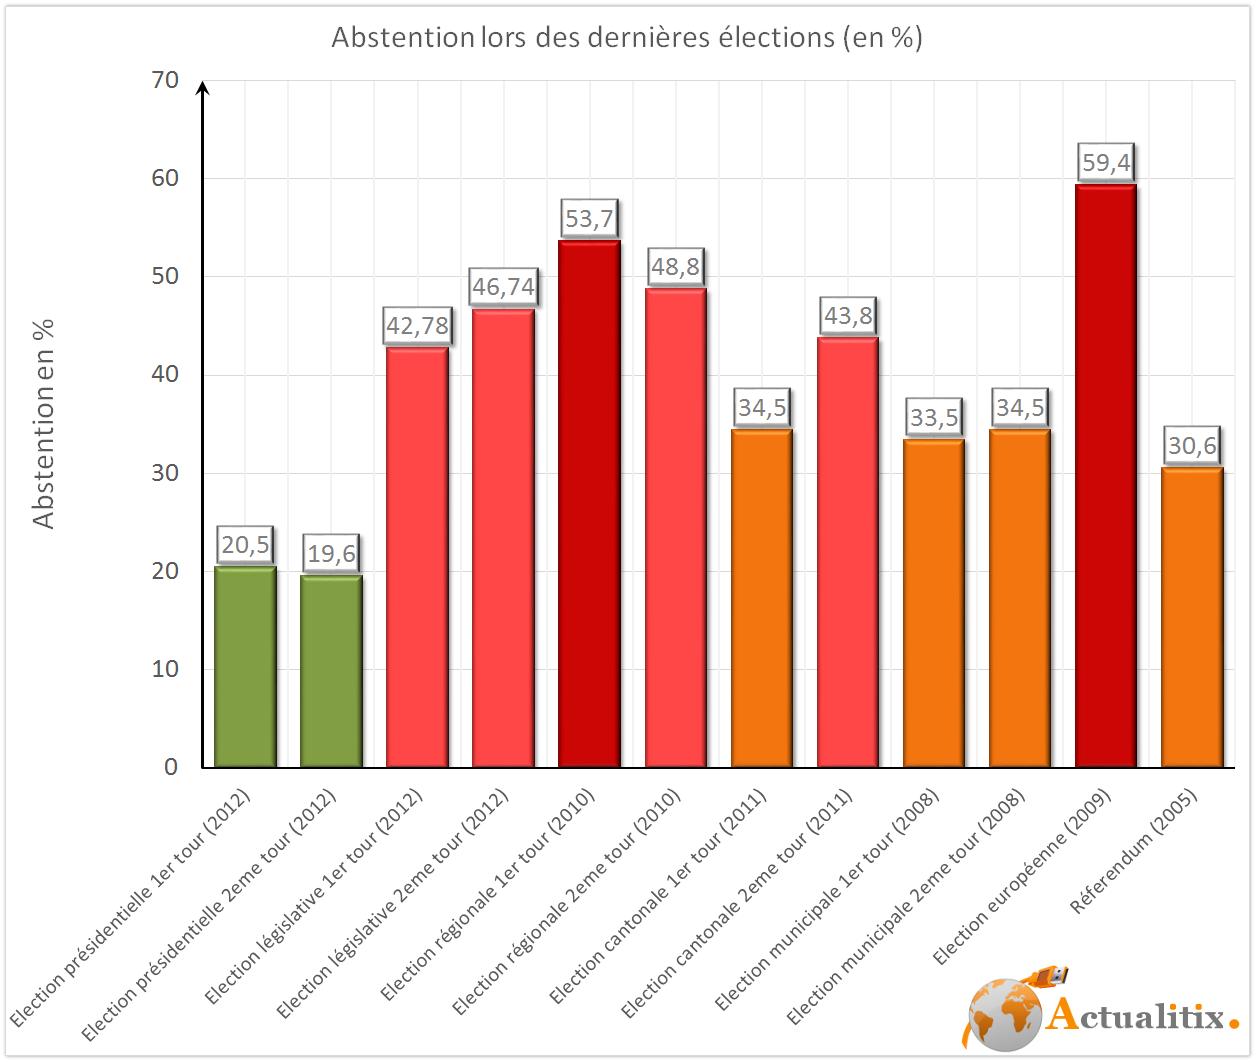 Abstention lors des dernières Elections en France